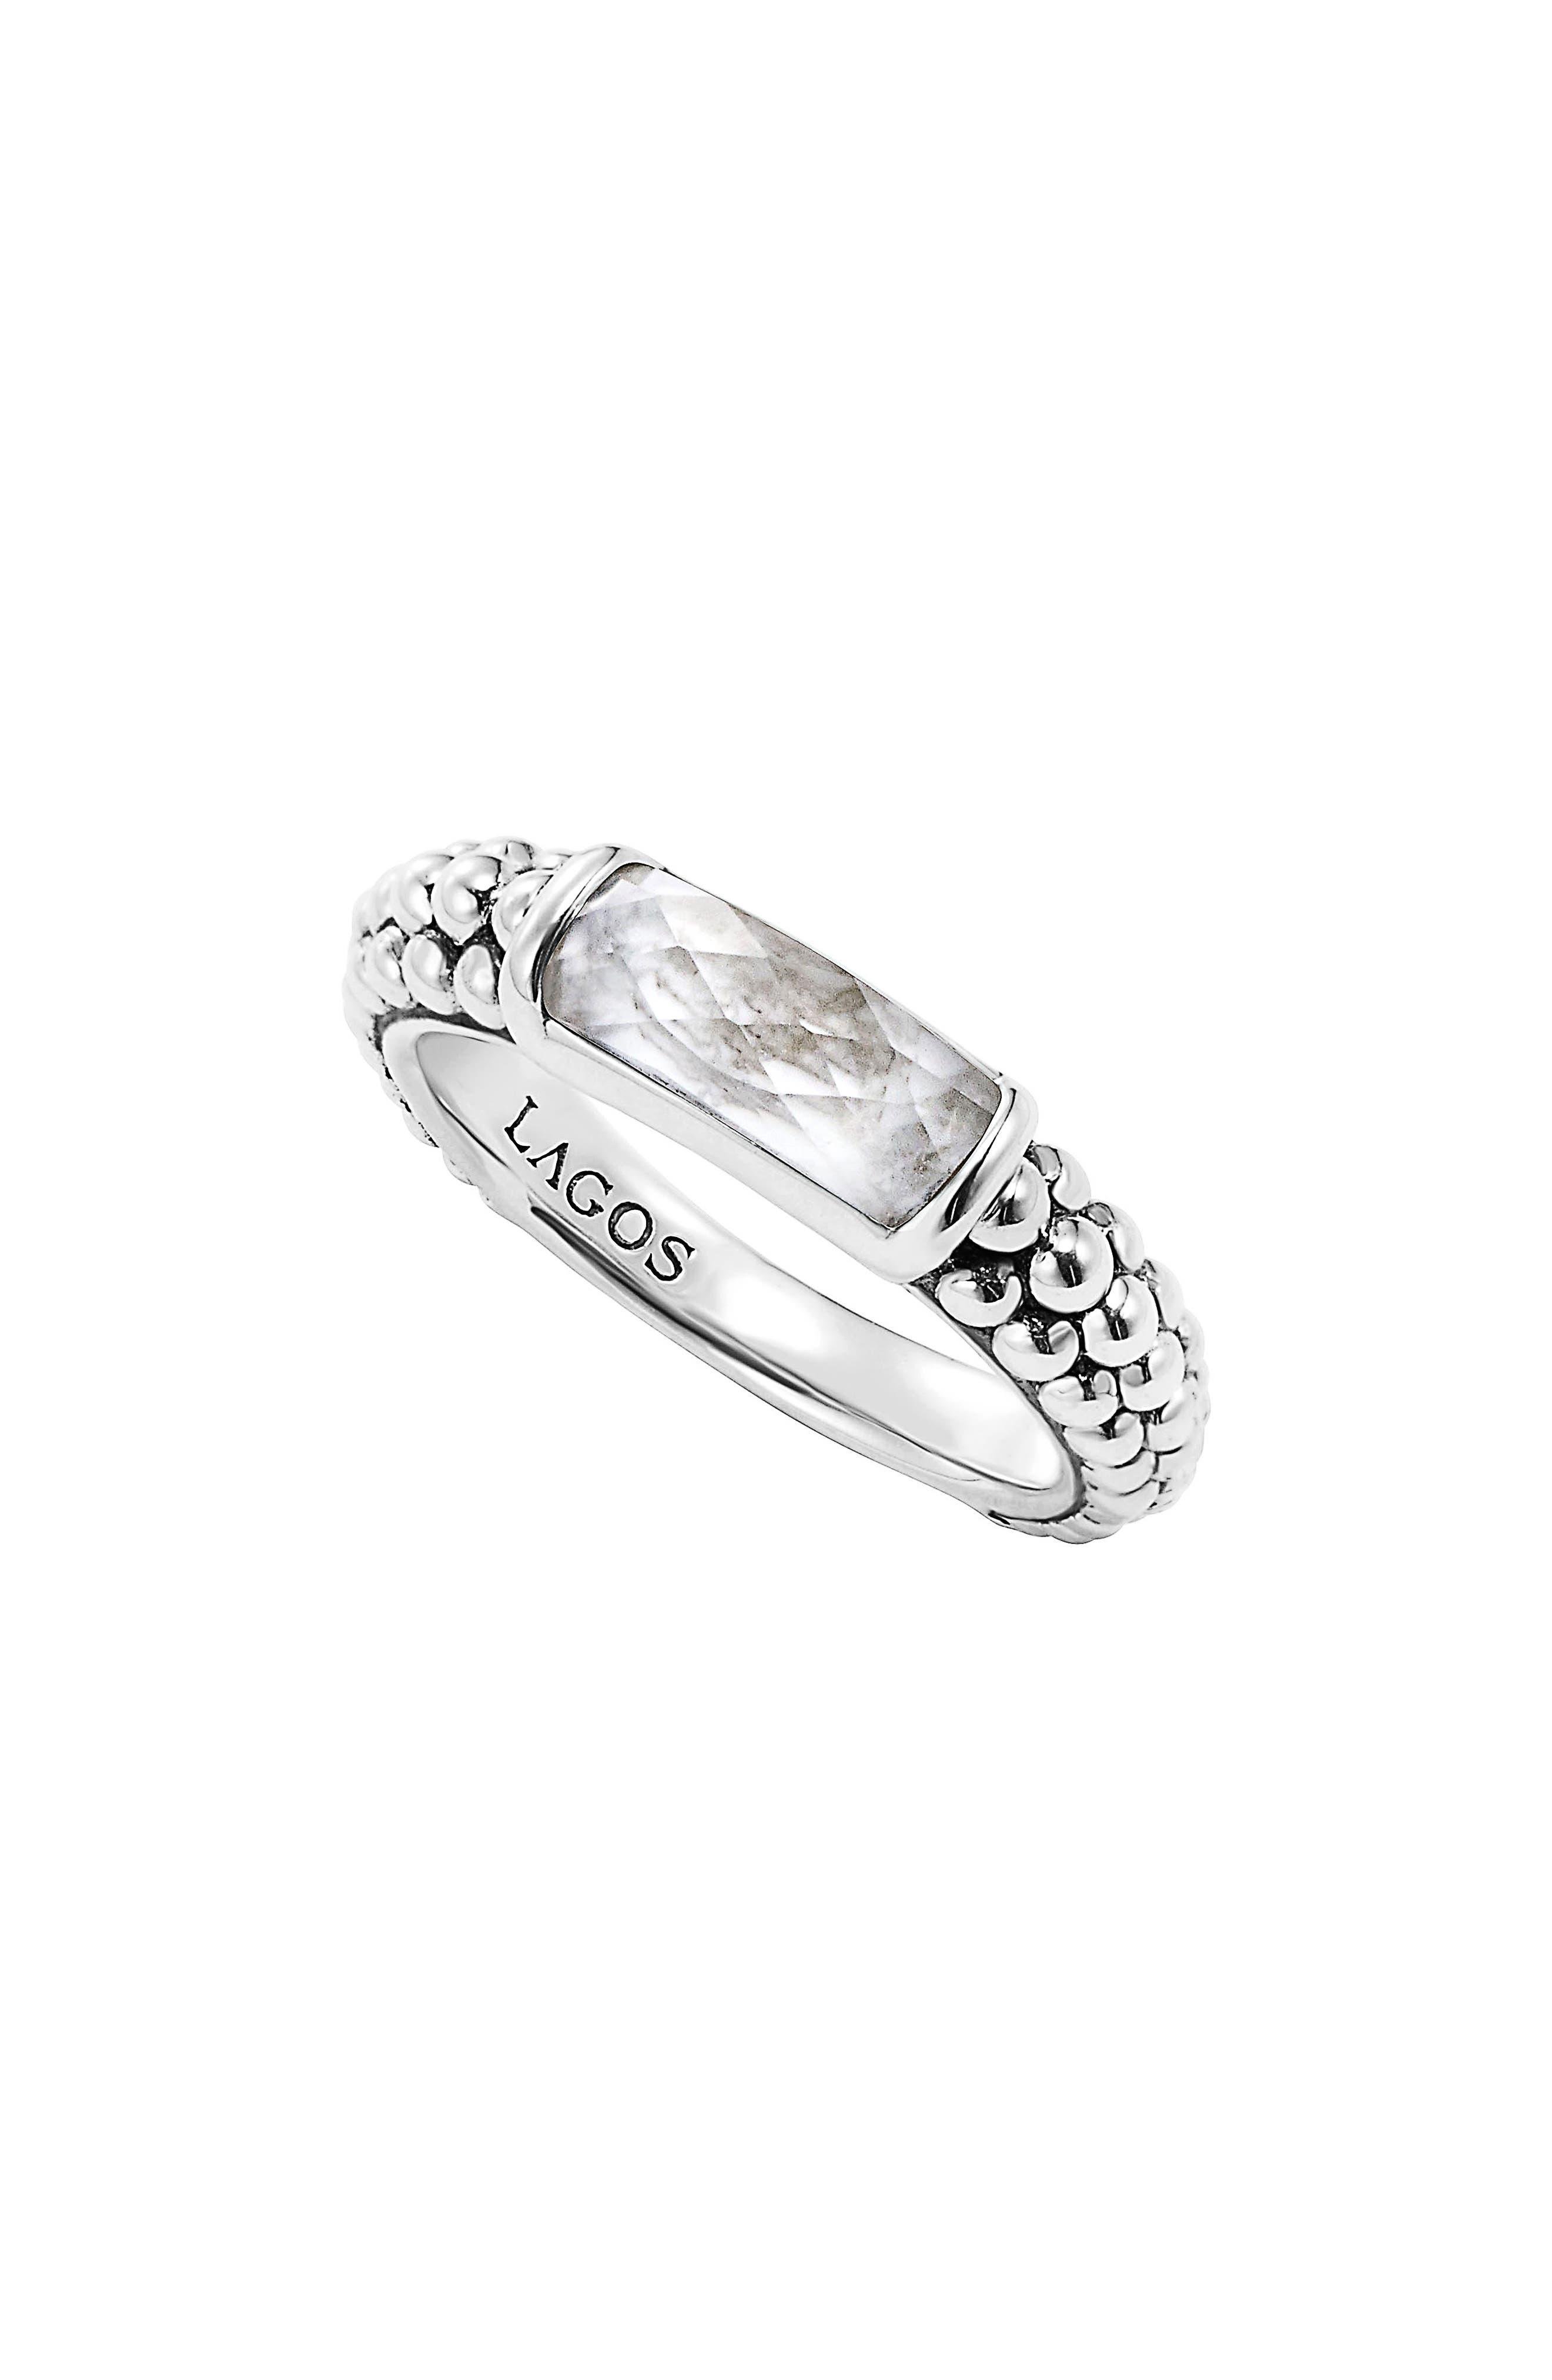 Alternate Image 1 Selected - LAGOS 'Maya' Stackable Caviar Ring